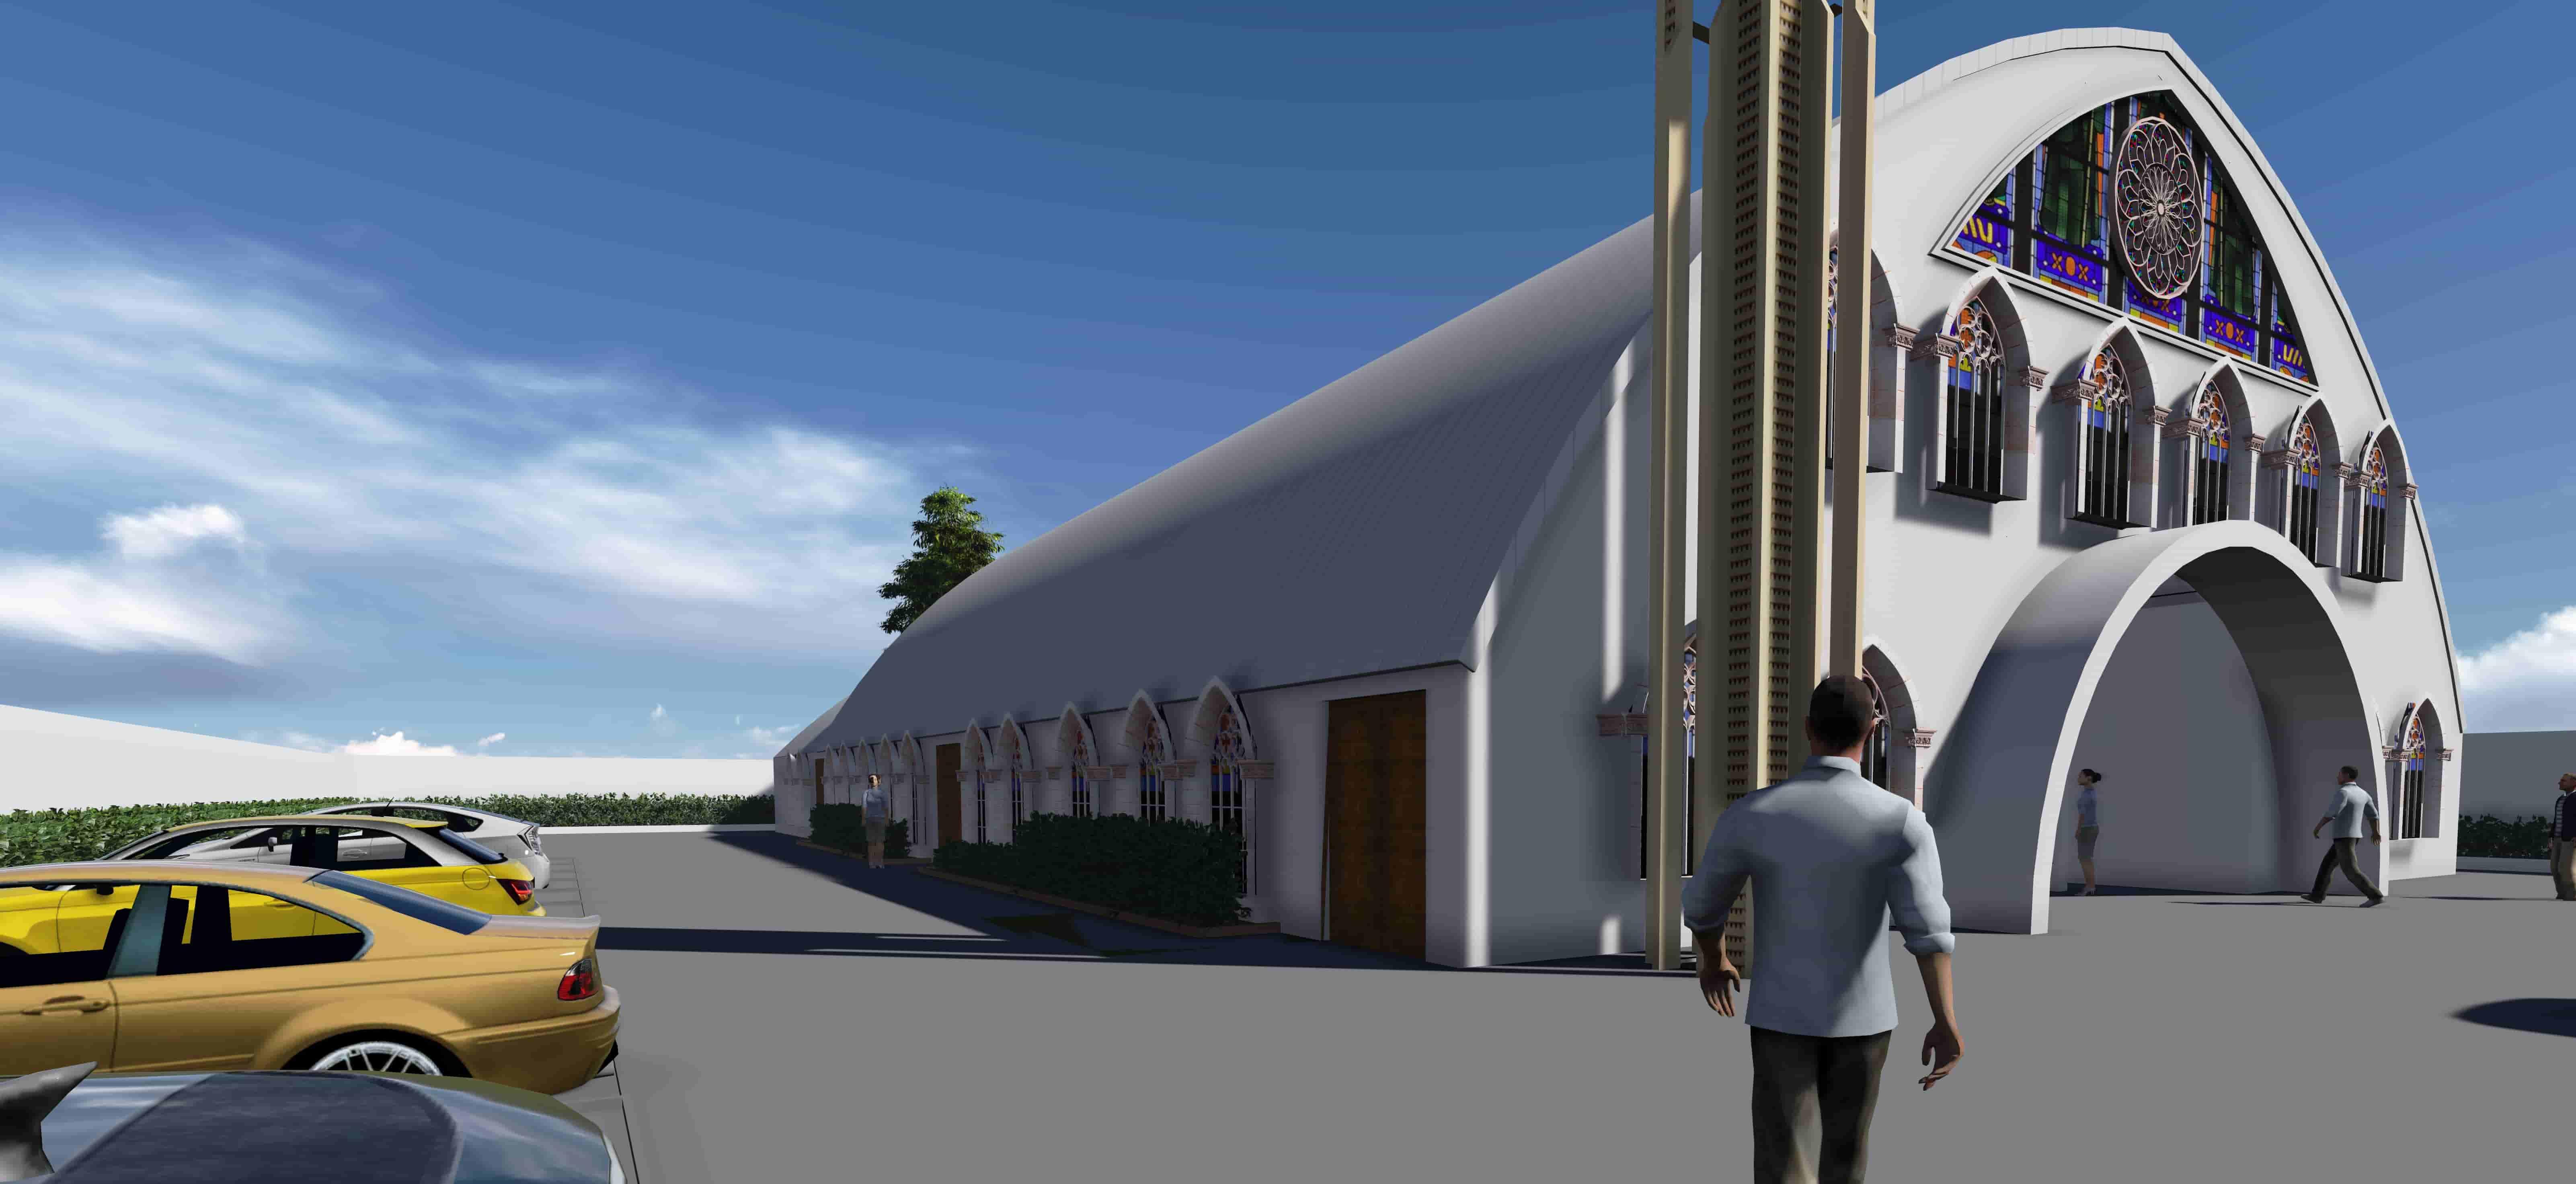 Proposed Church Design